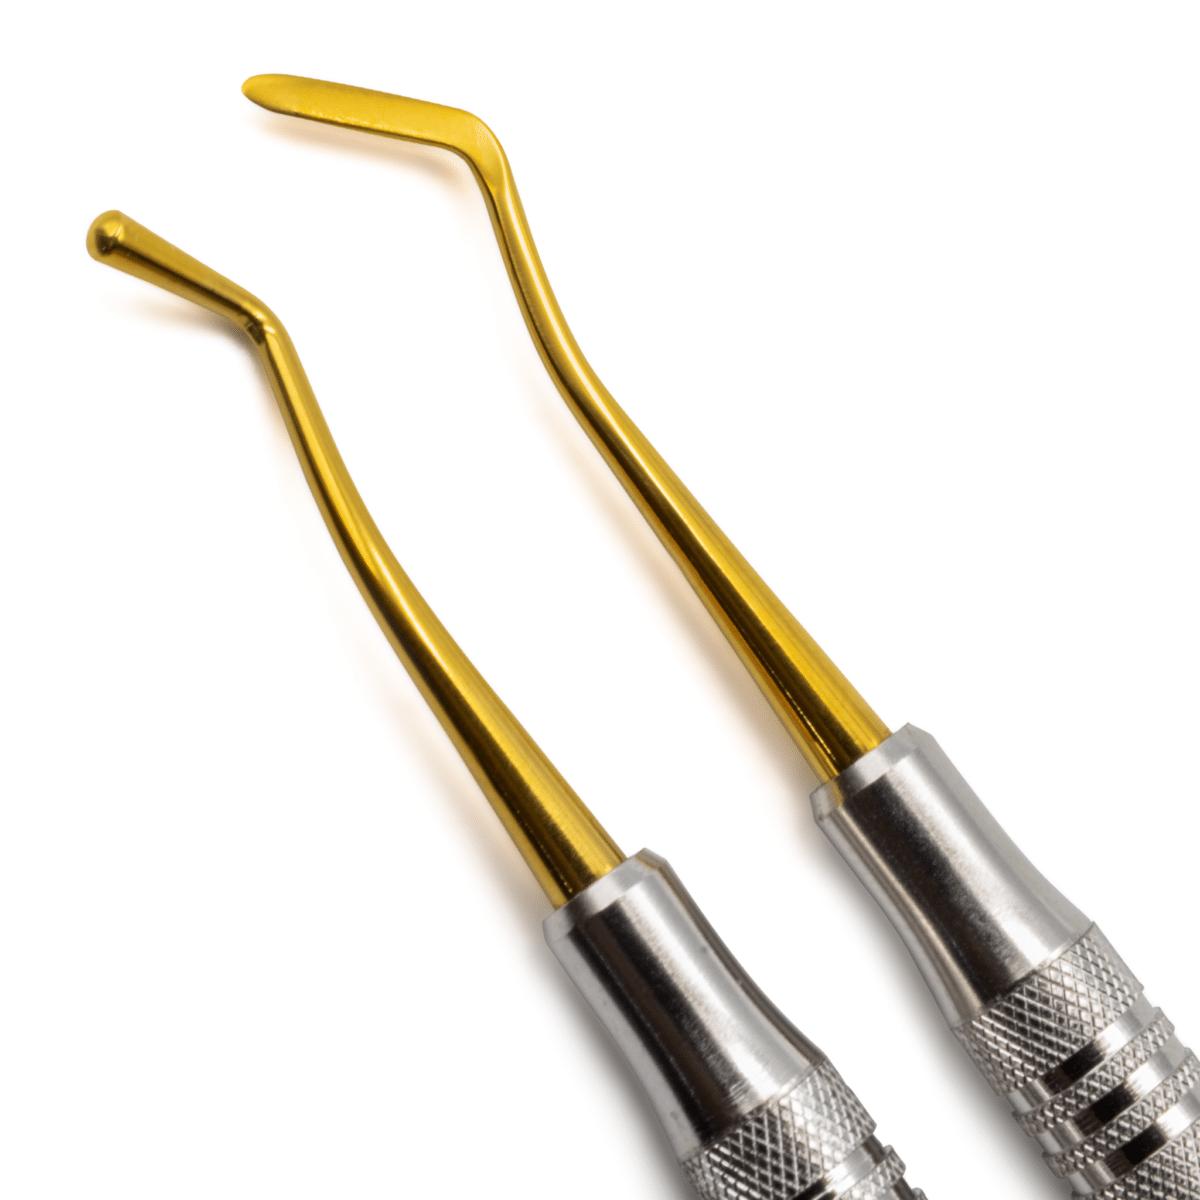 Instrumento Composite #7 Ni-Ti -Marca: American Eagle Restauradora | Odontology BG